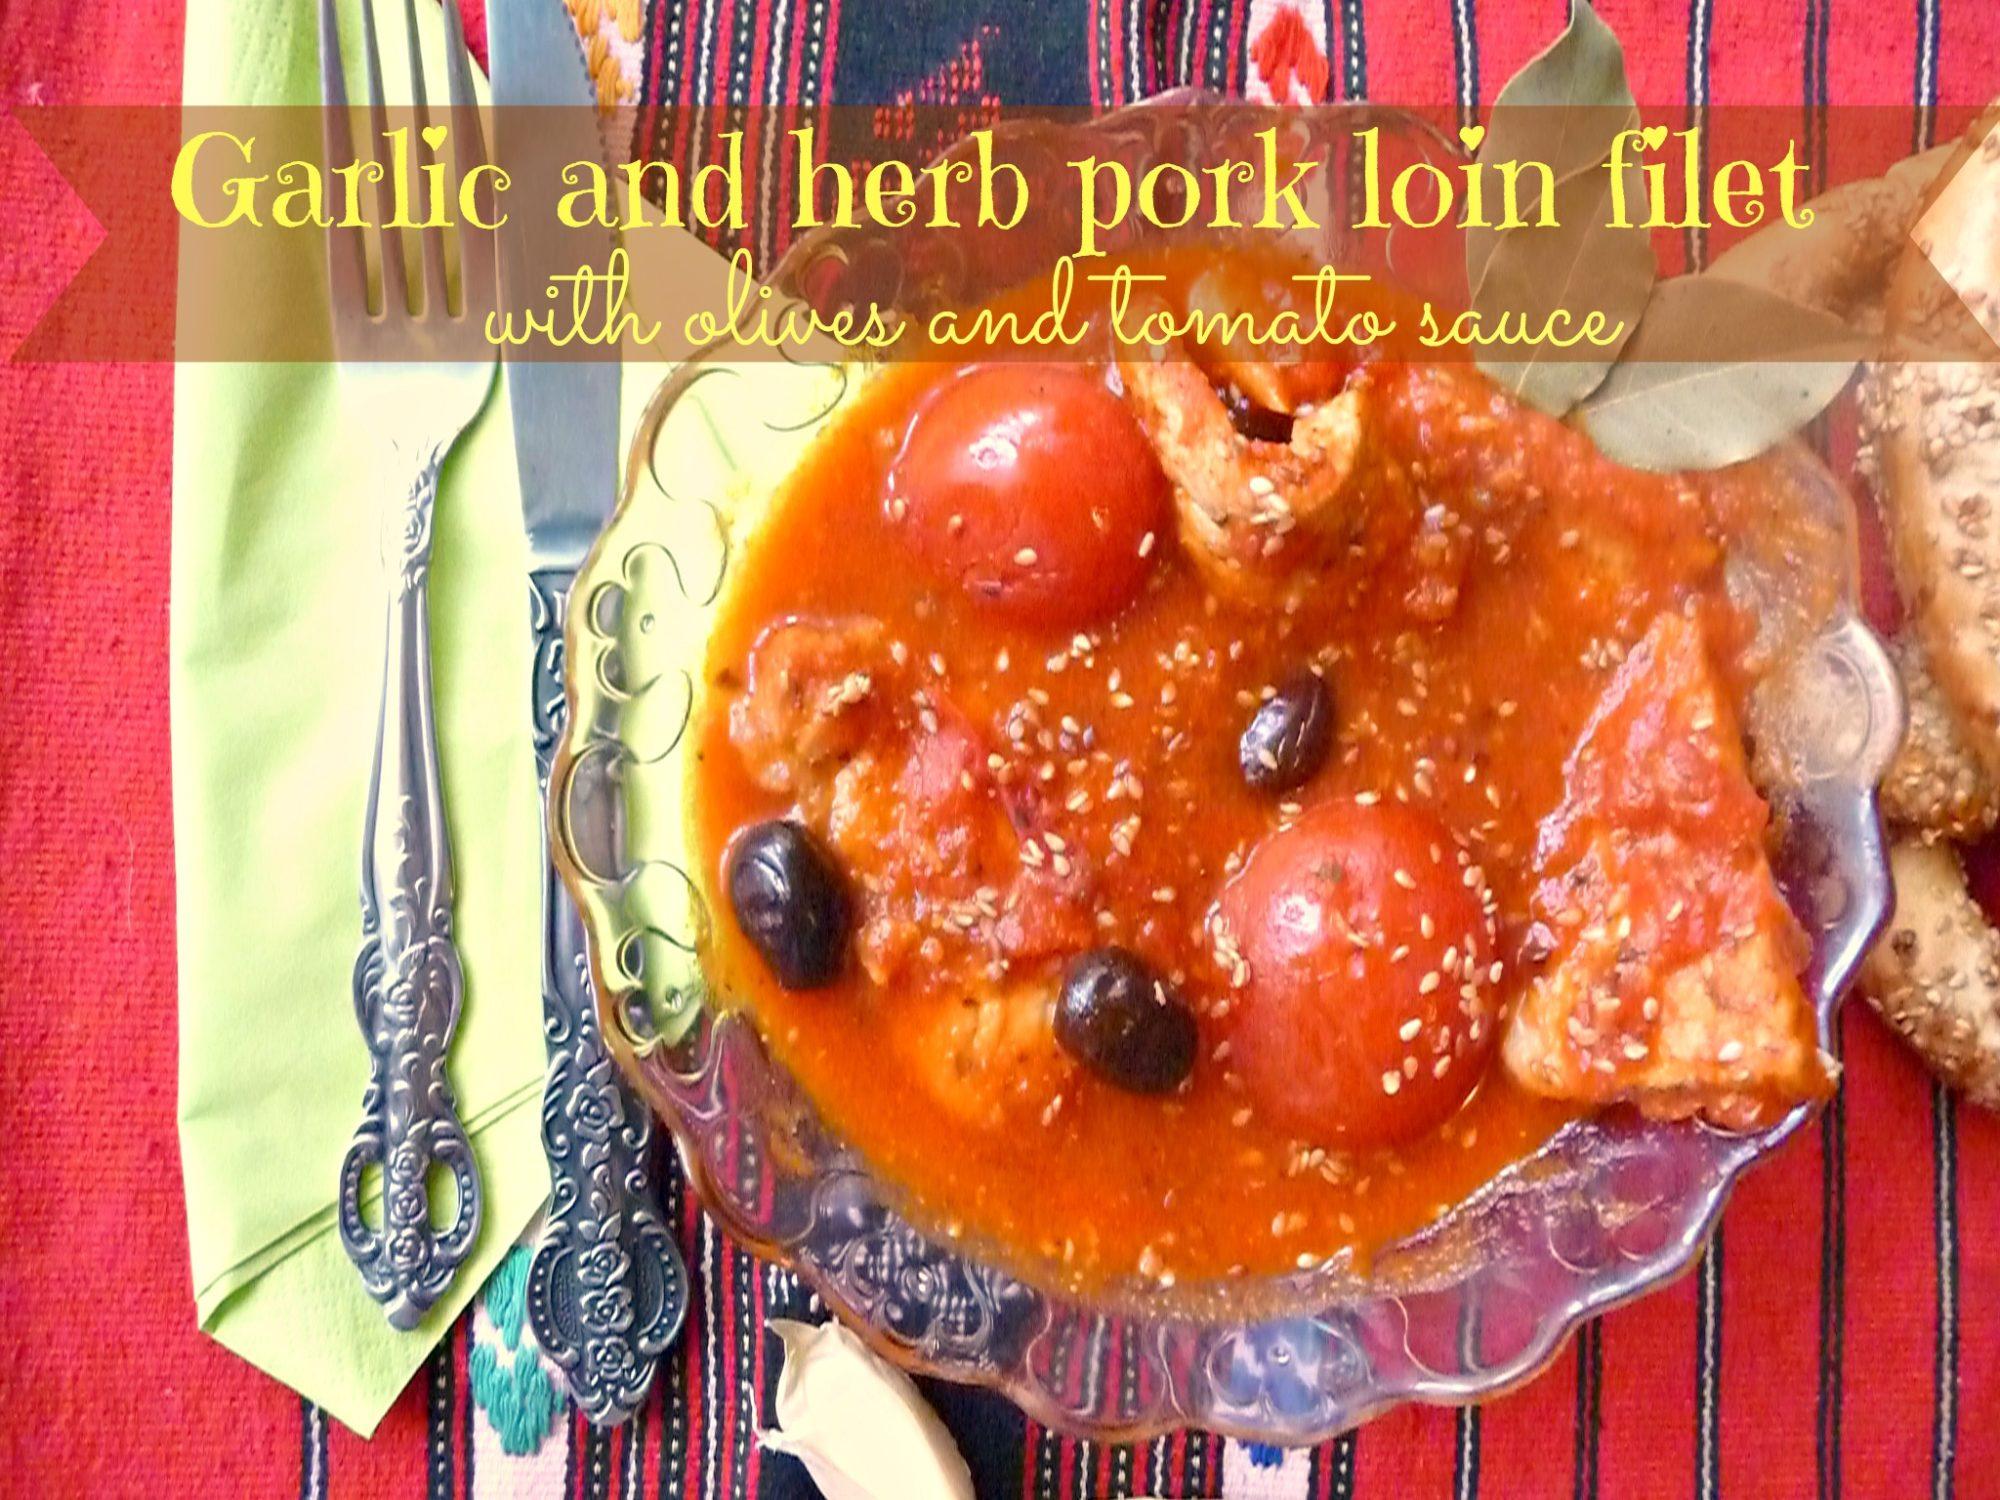 Quick marinated pork loinQuick marinated pork loin